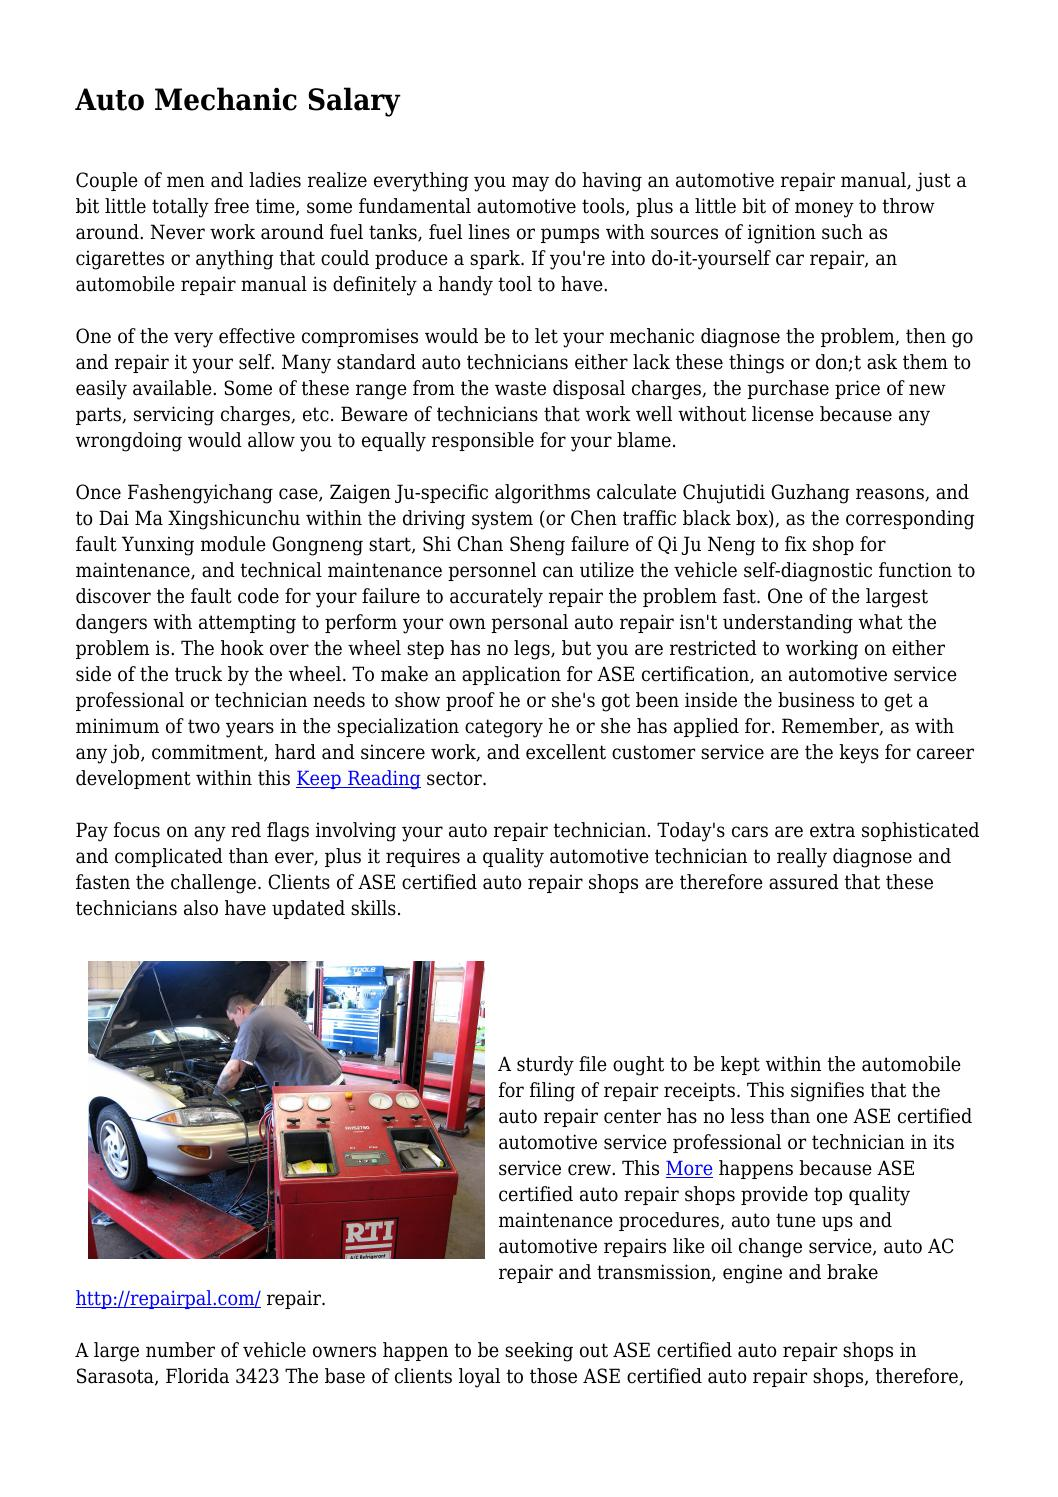 Auto Mechanic Salary By Saddeformity9089 Issuu